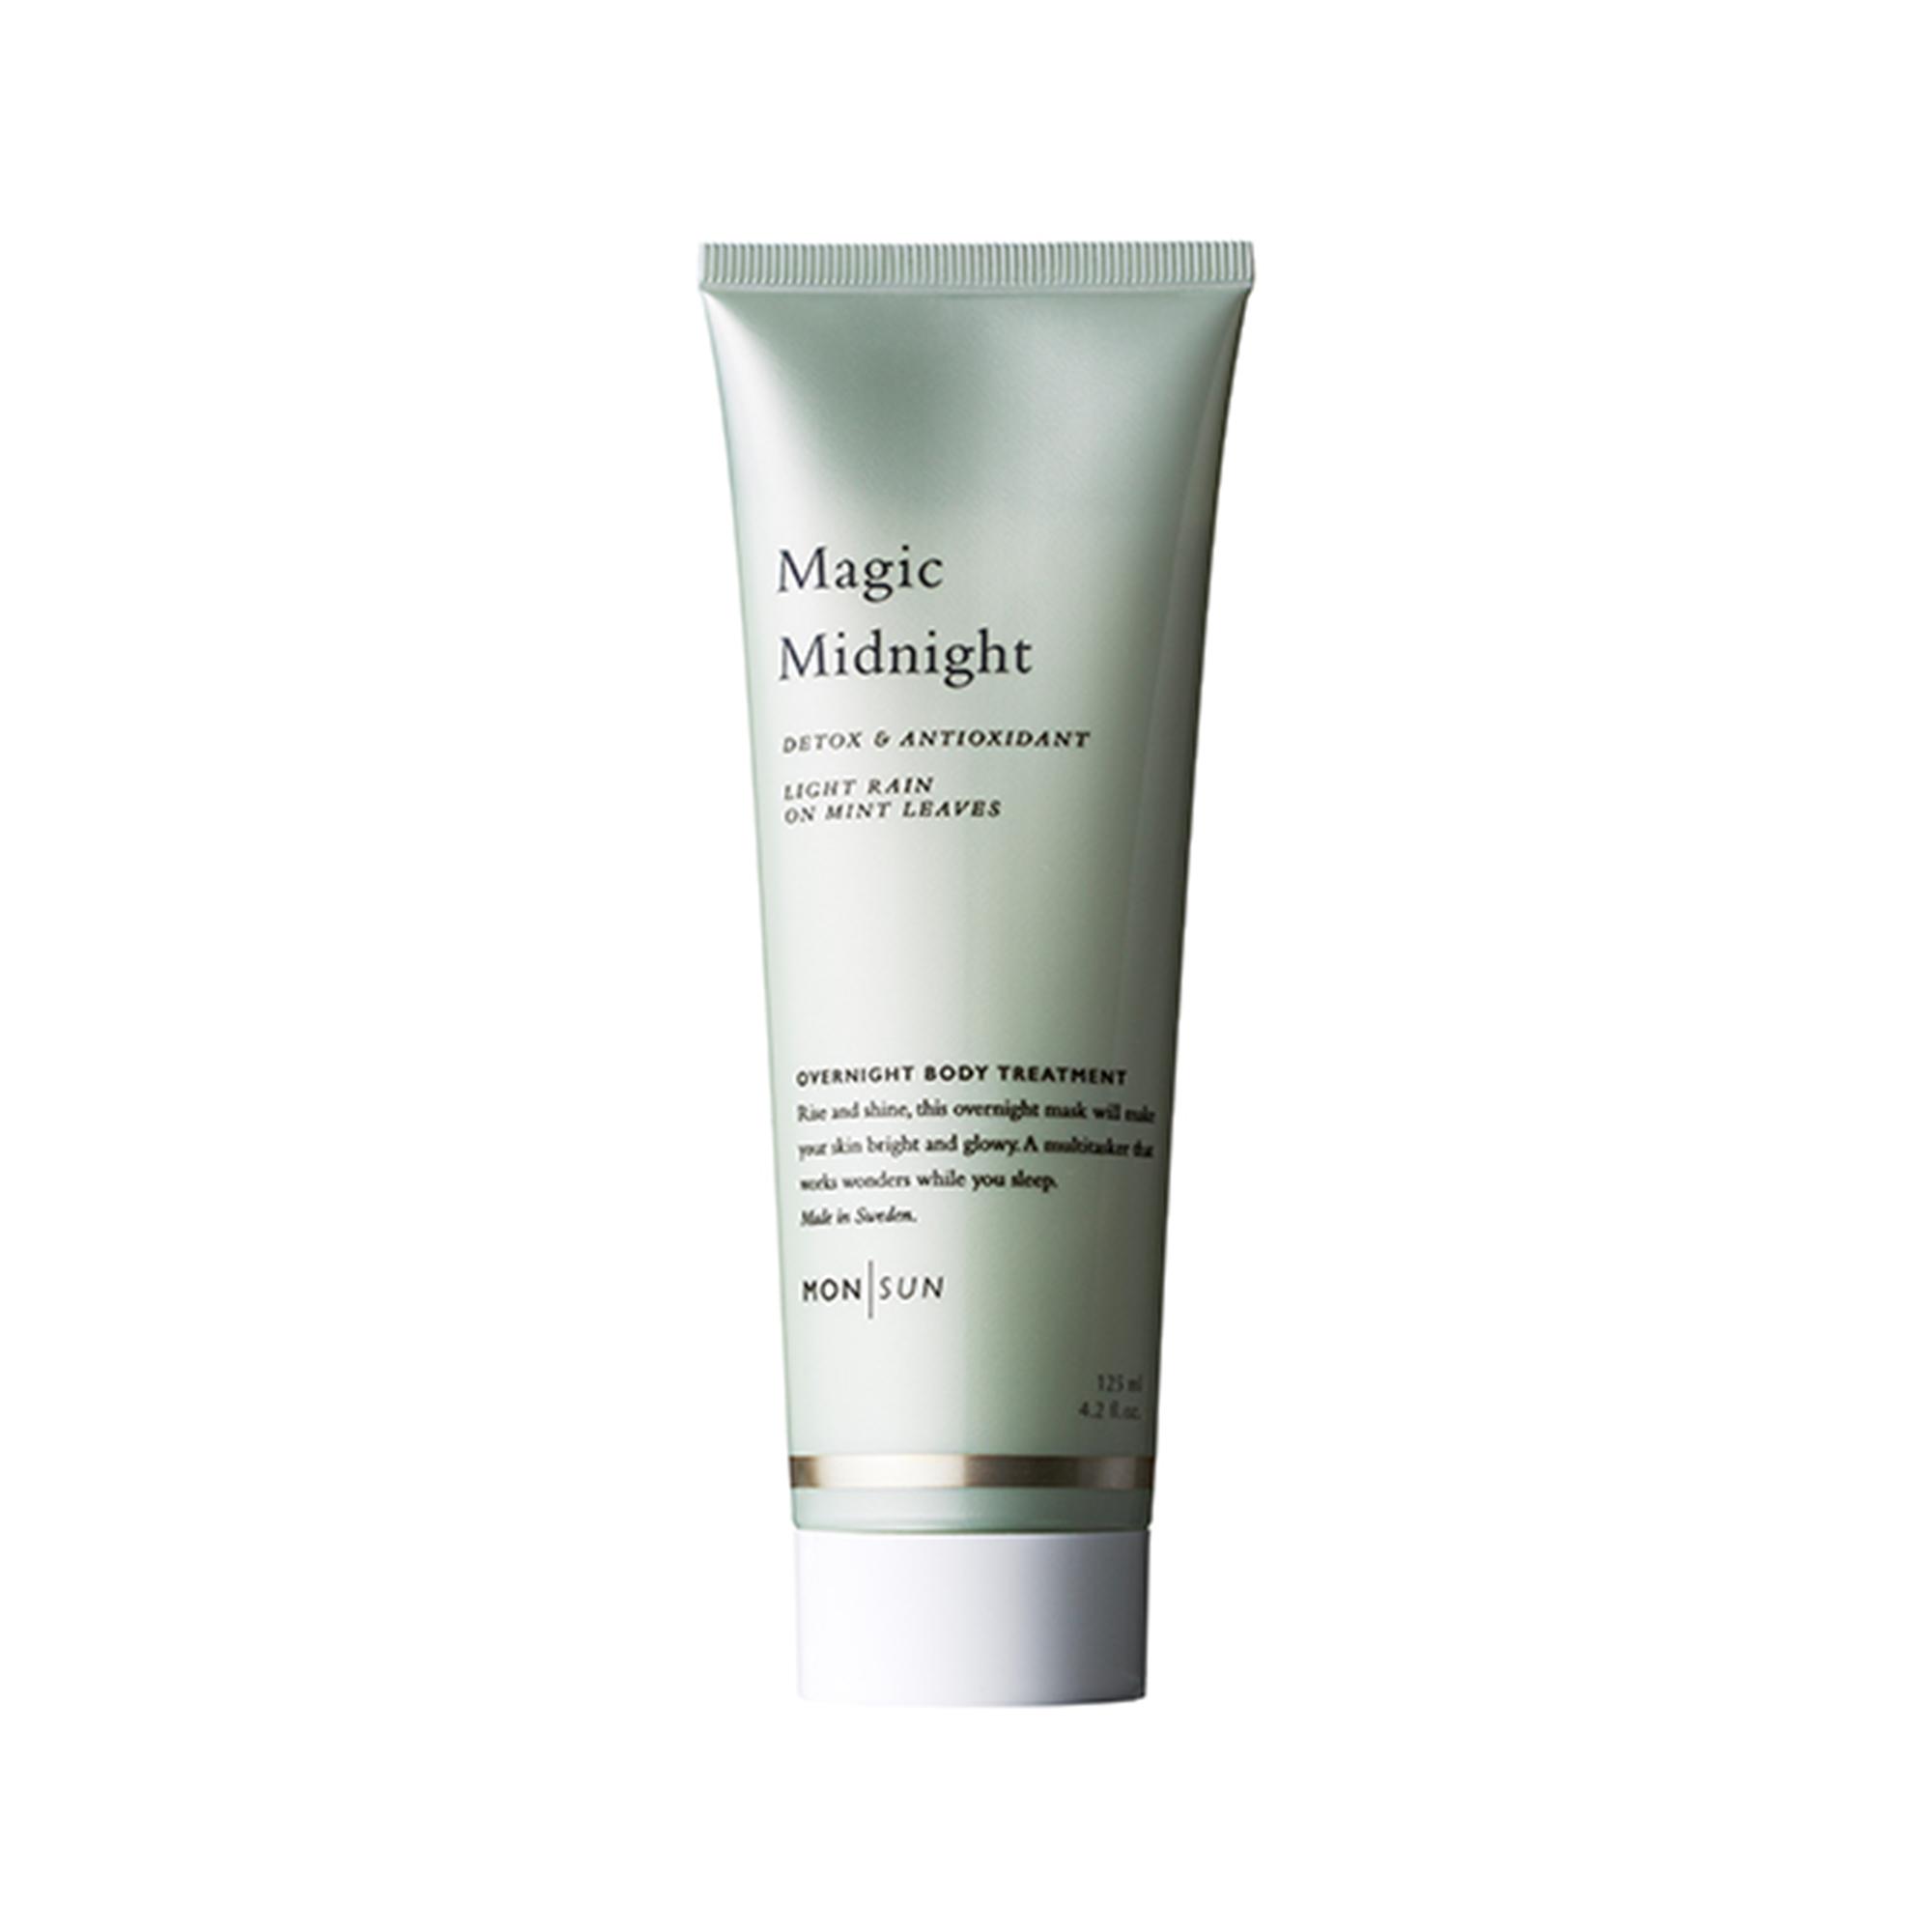 Magic Midnight Detox & Antioxidant Overnight Body Treatment 125ml